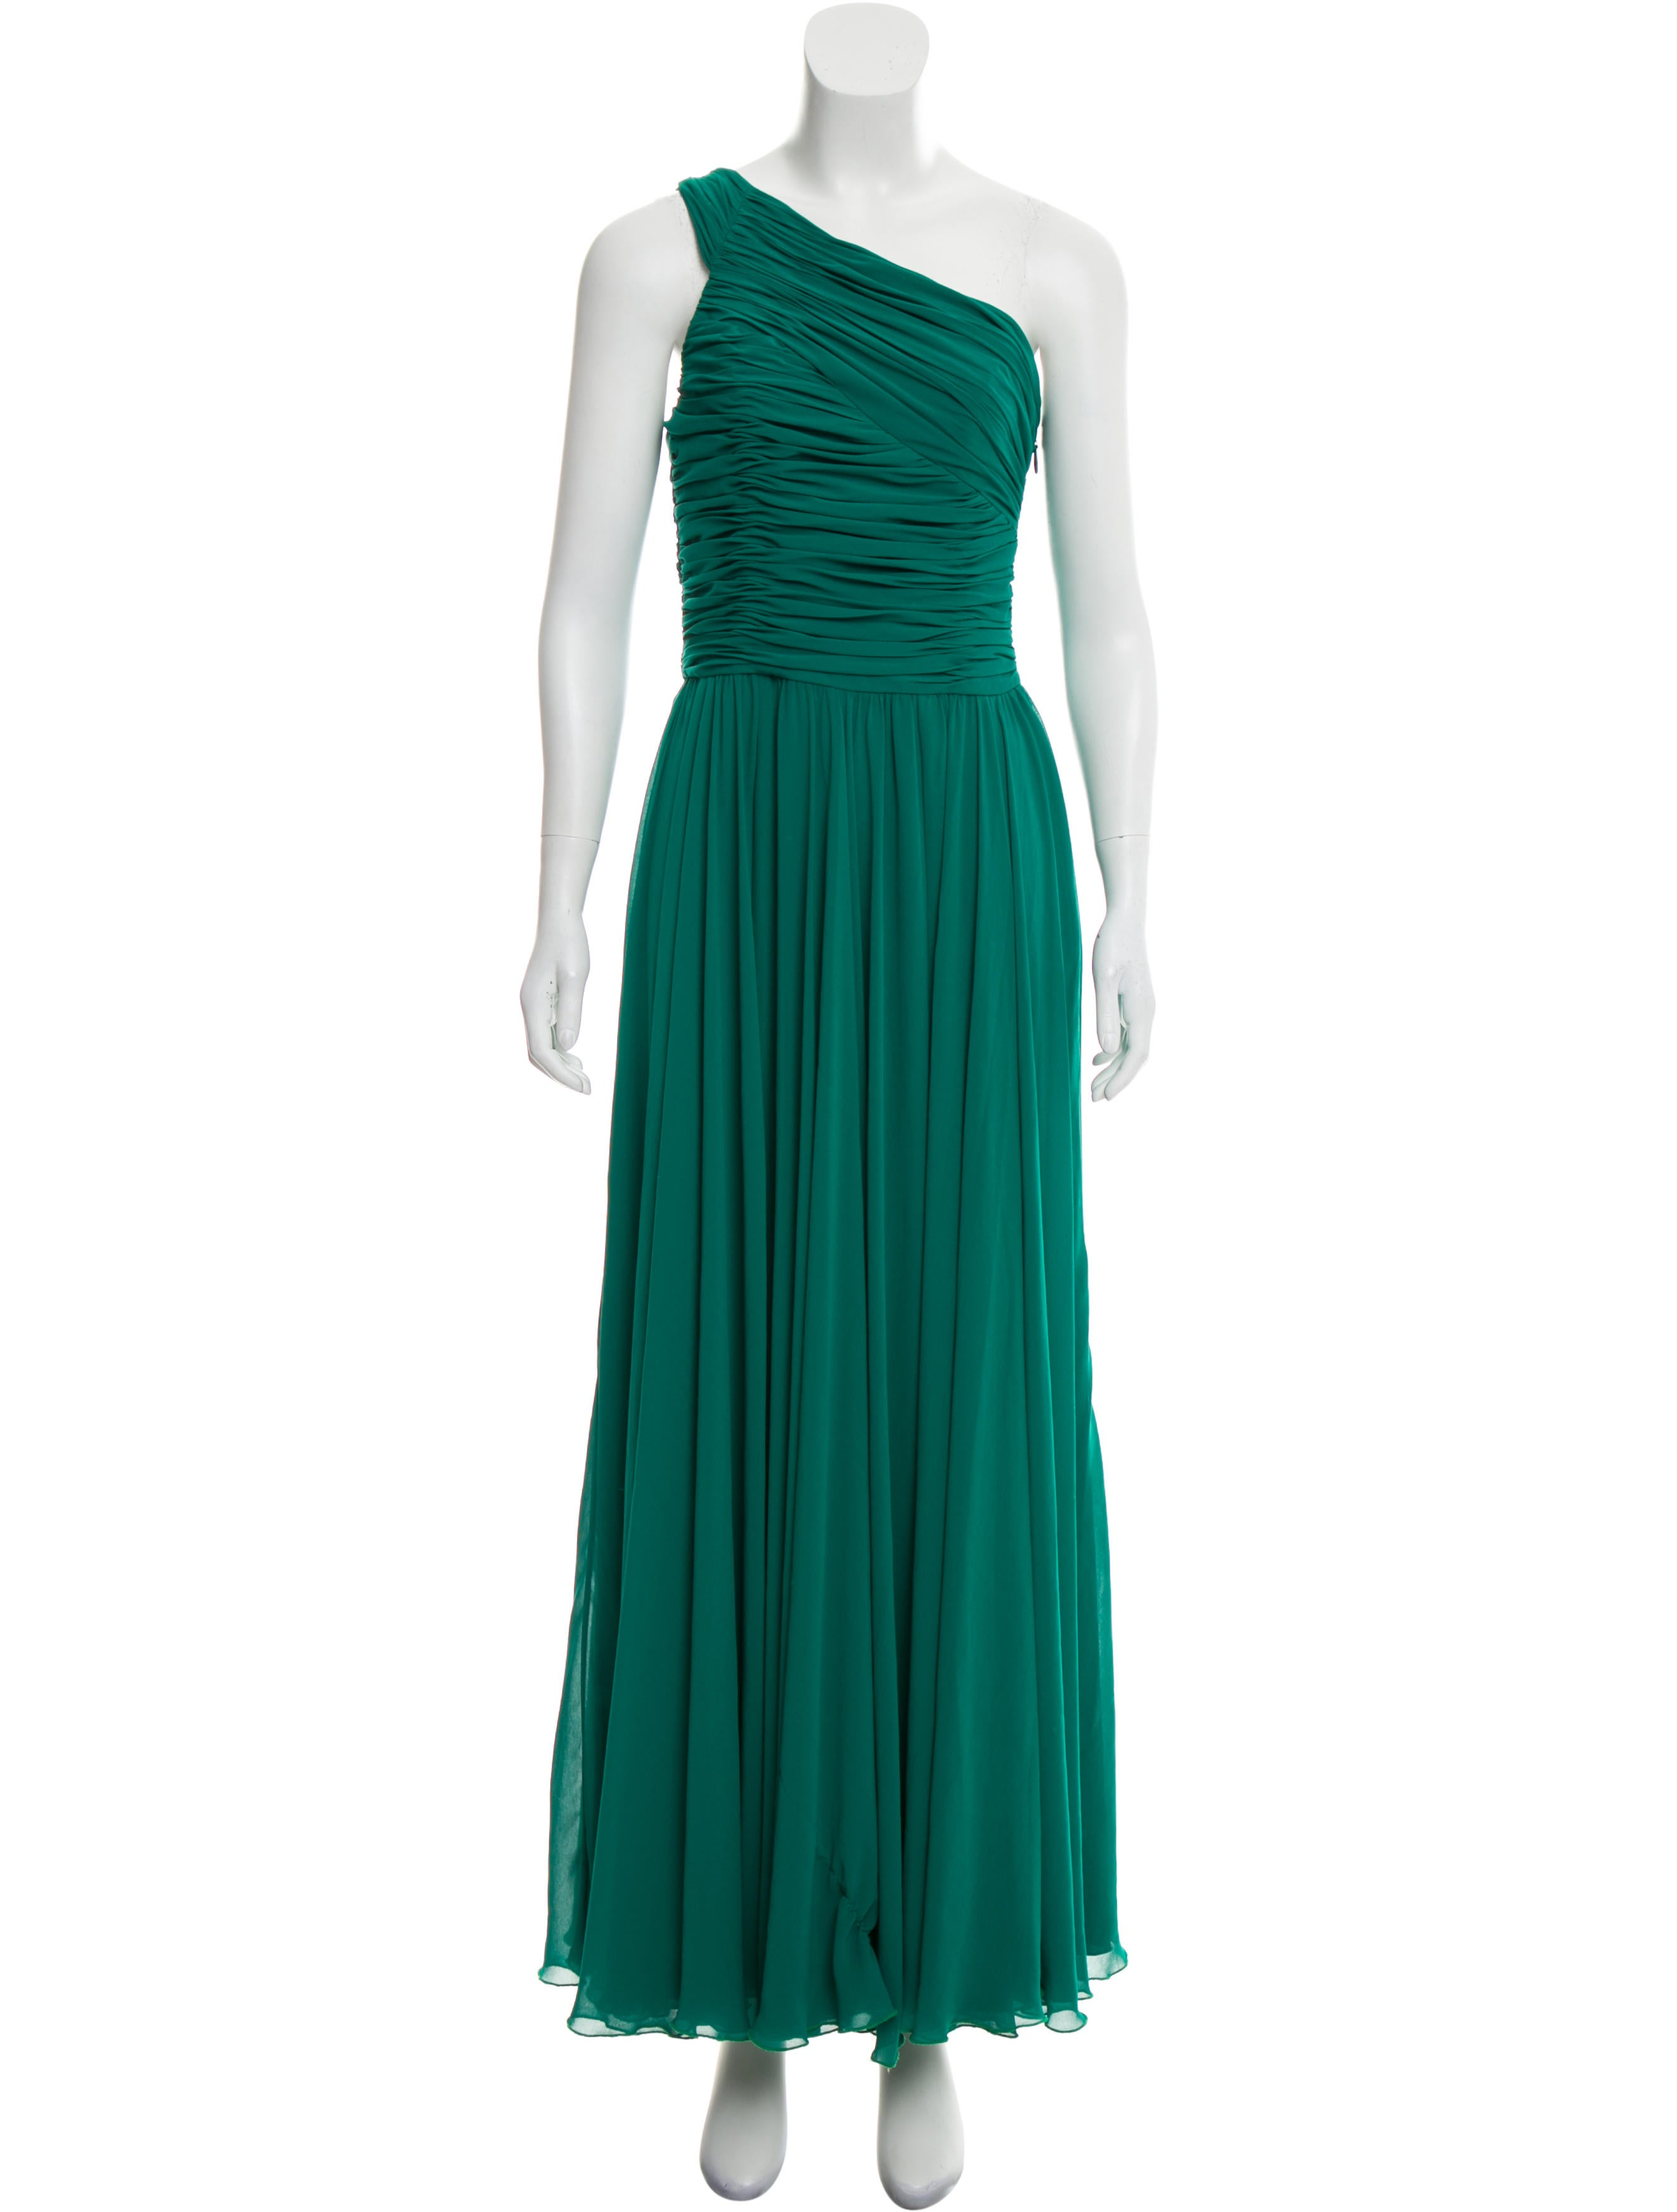 Halston Heritage One-Shoulder Evening Dress - Clothing - WH129447 ...